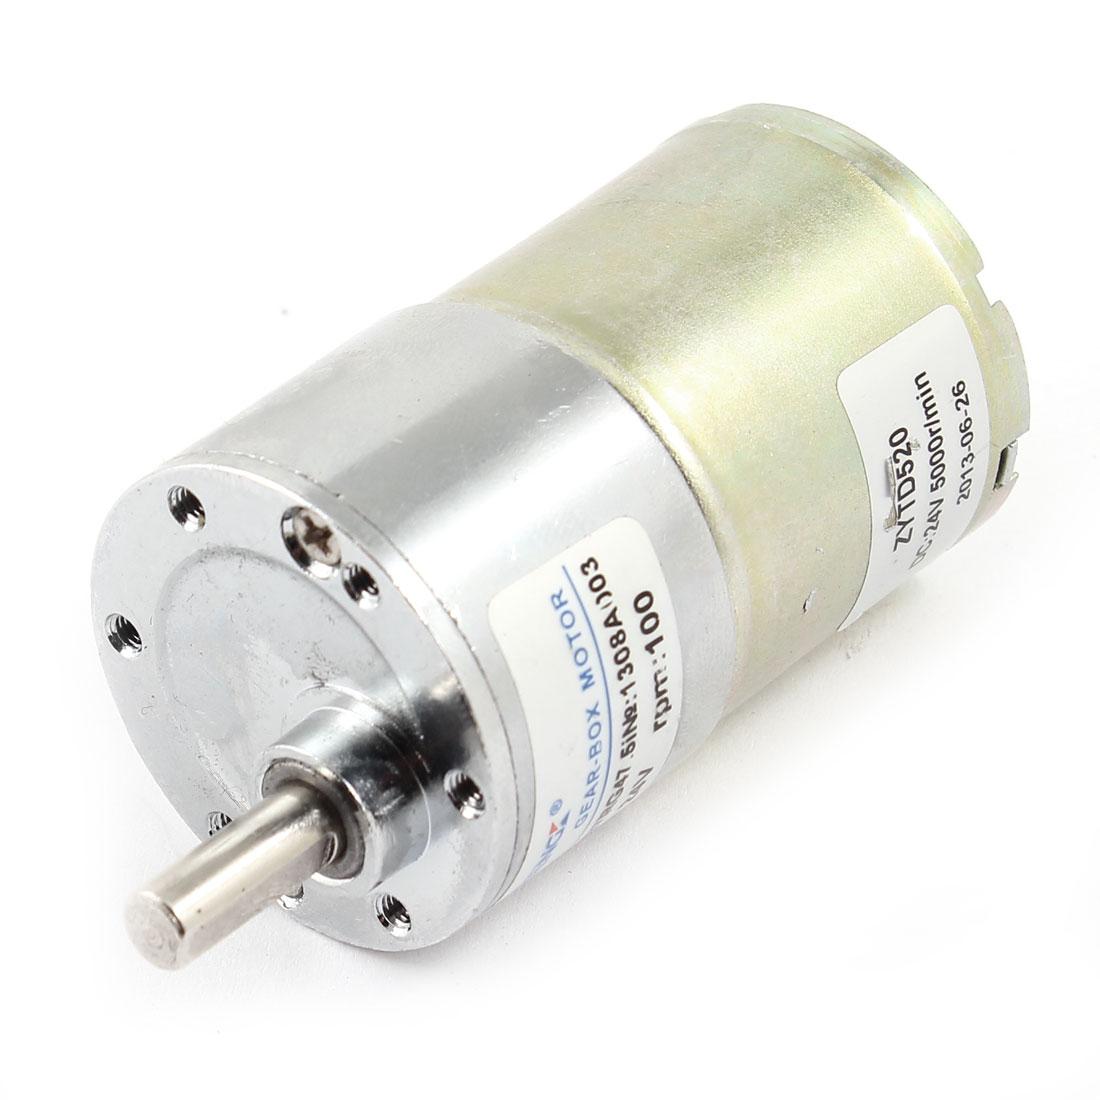 DC 24V 0.33A 2.6kg.cm Torque 37mm Dia Magnetic Gear Box Motor 100 RPM